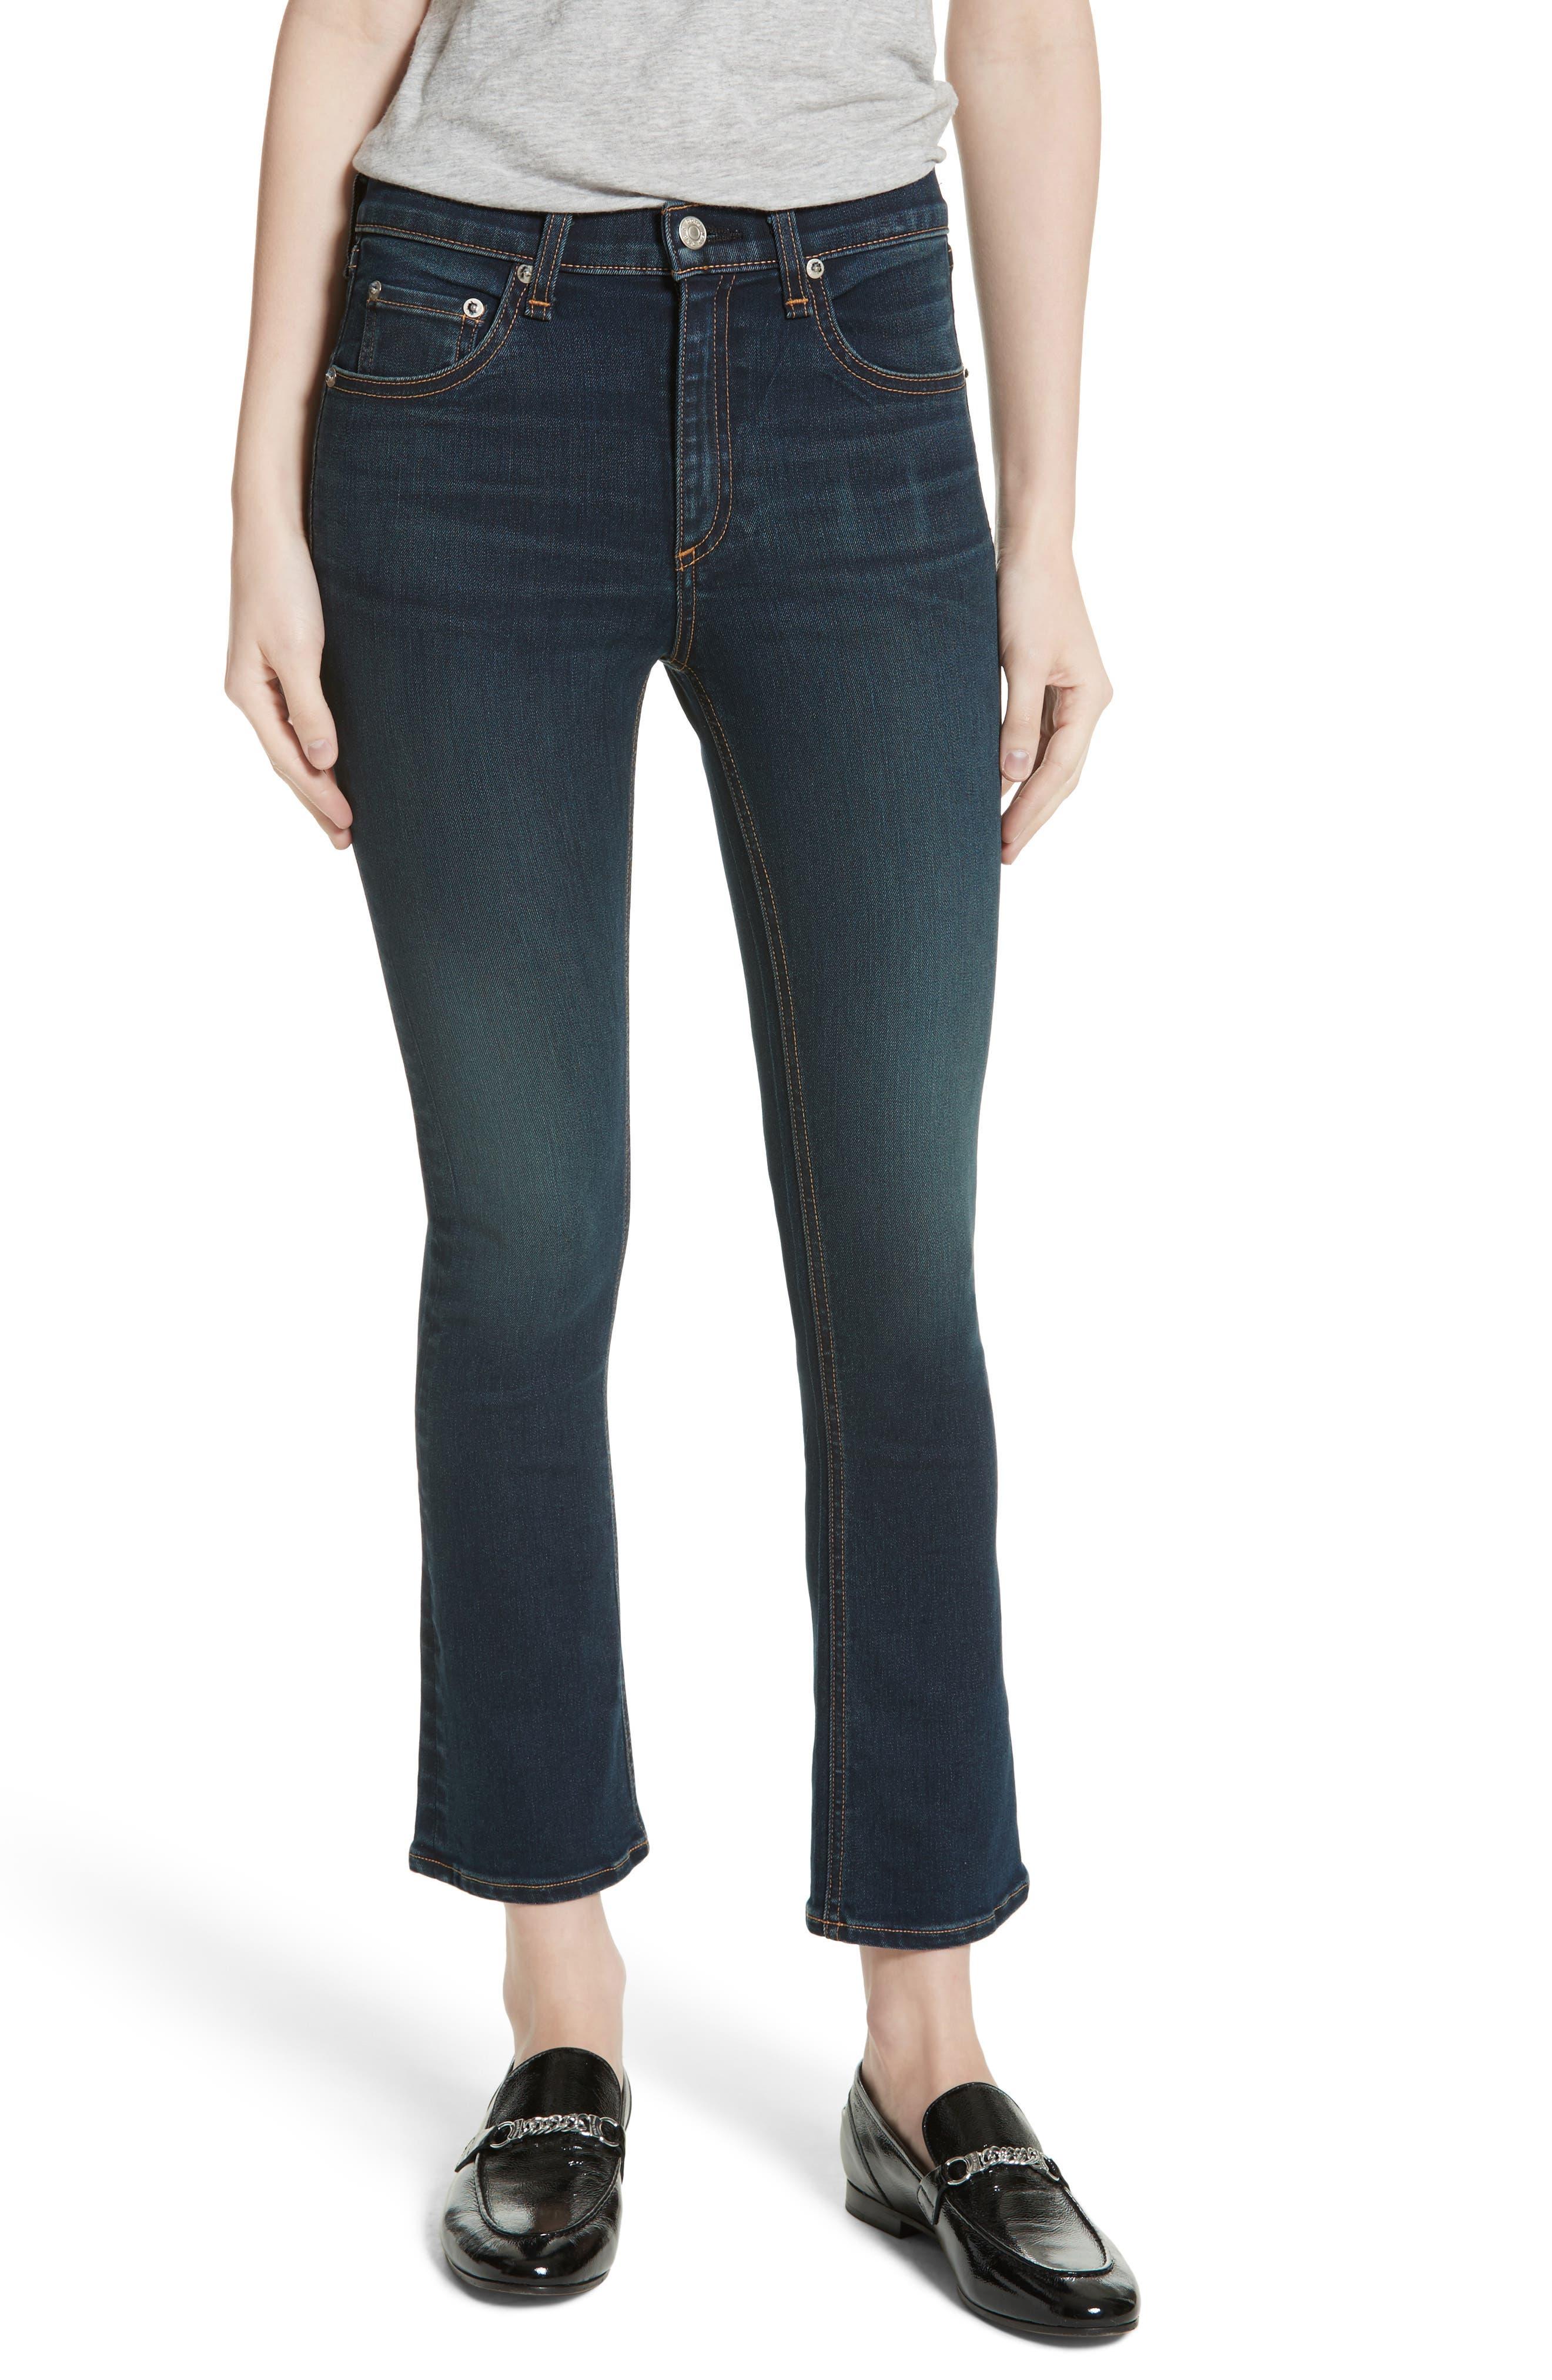 RAG & BONE/JEAN Hana High Waist Crop Flare Jeans